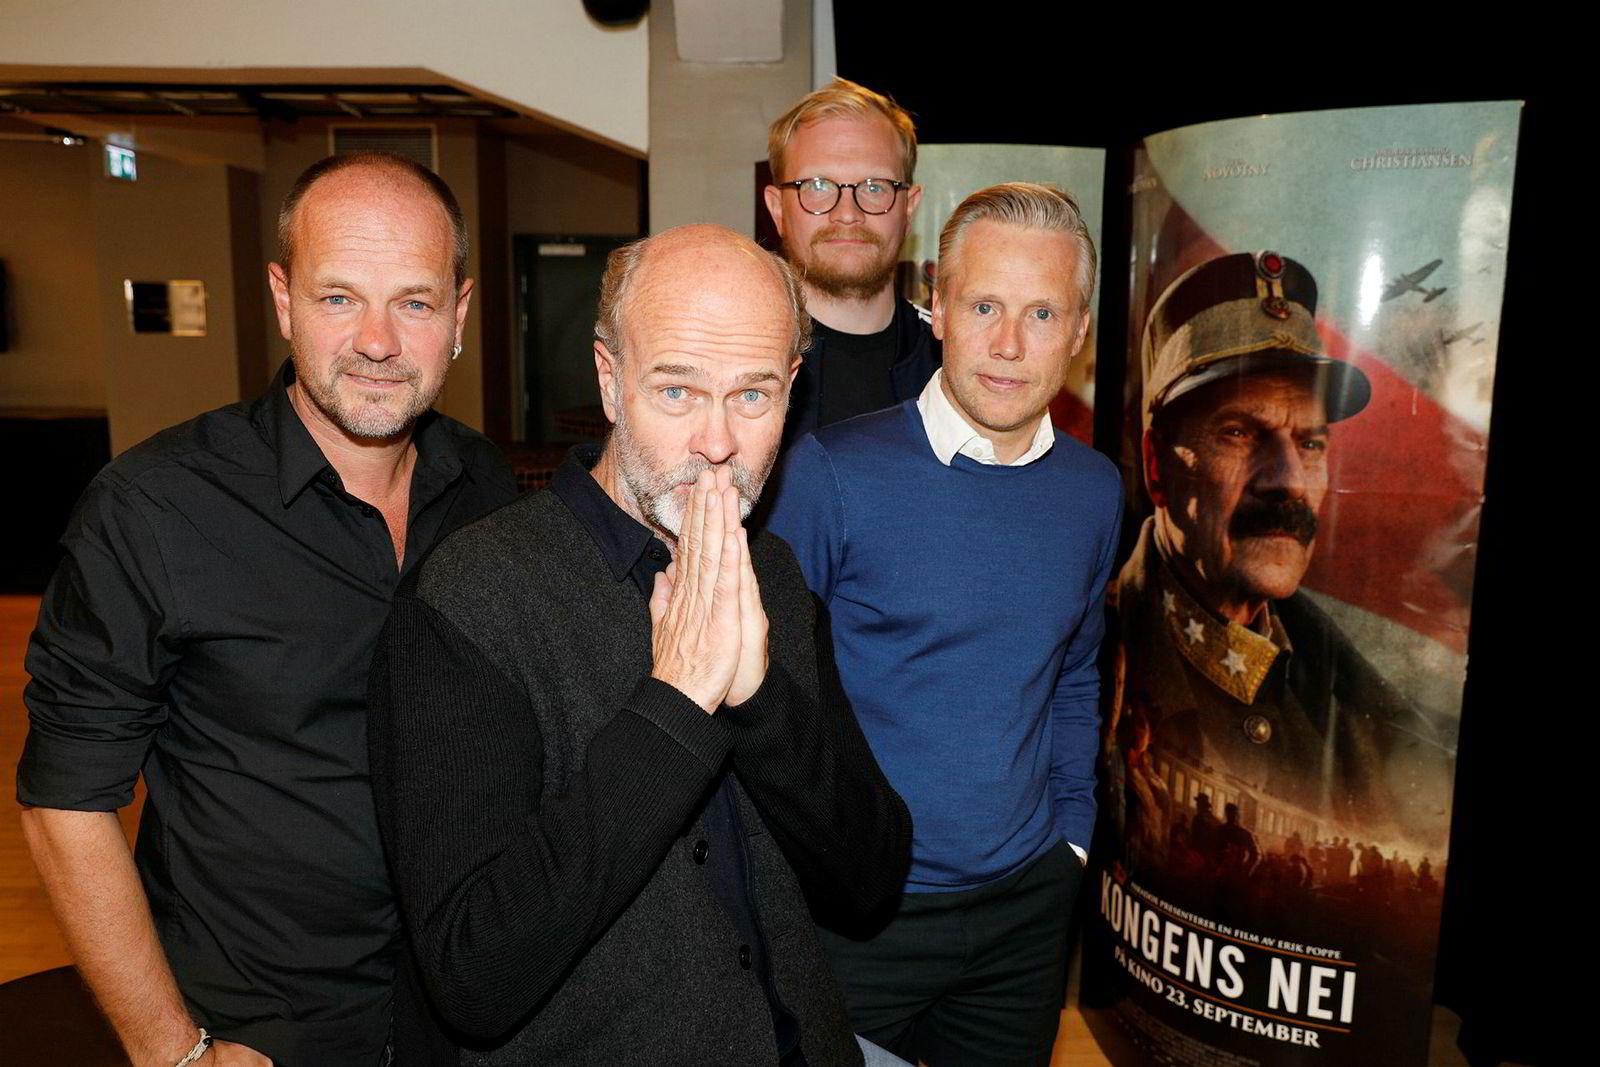 Regissør Erik Poppe (foran), manusforfatterne Jan Trygve Røyneland, Harald Rosenløw Eeg og produsent Stein B. Kvae.